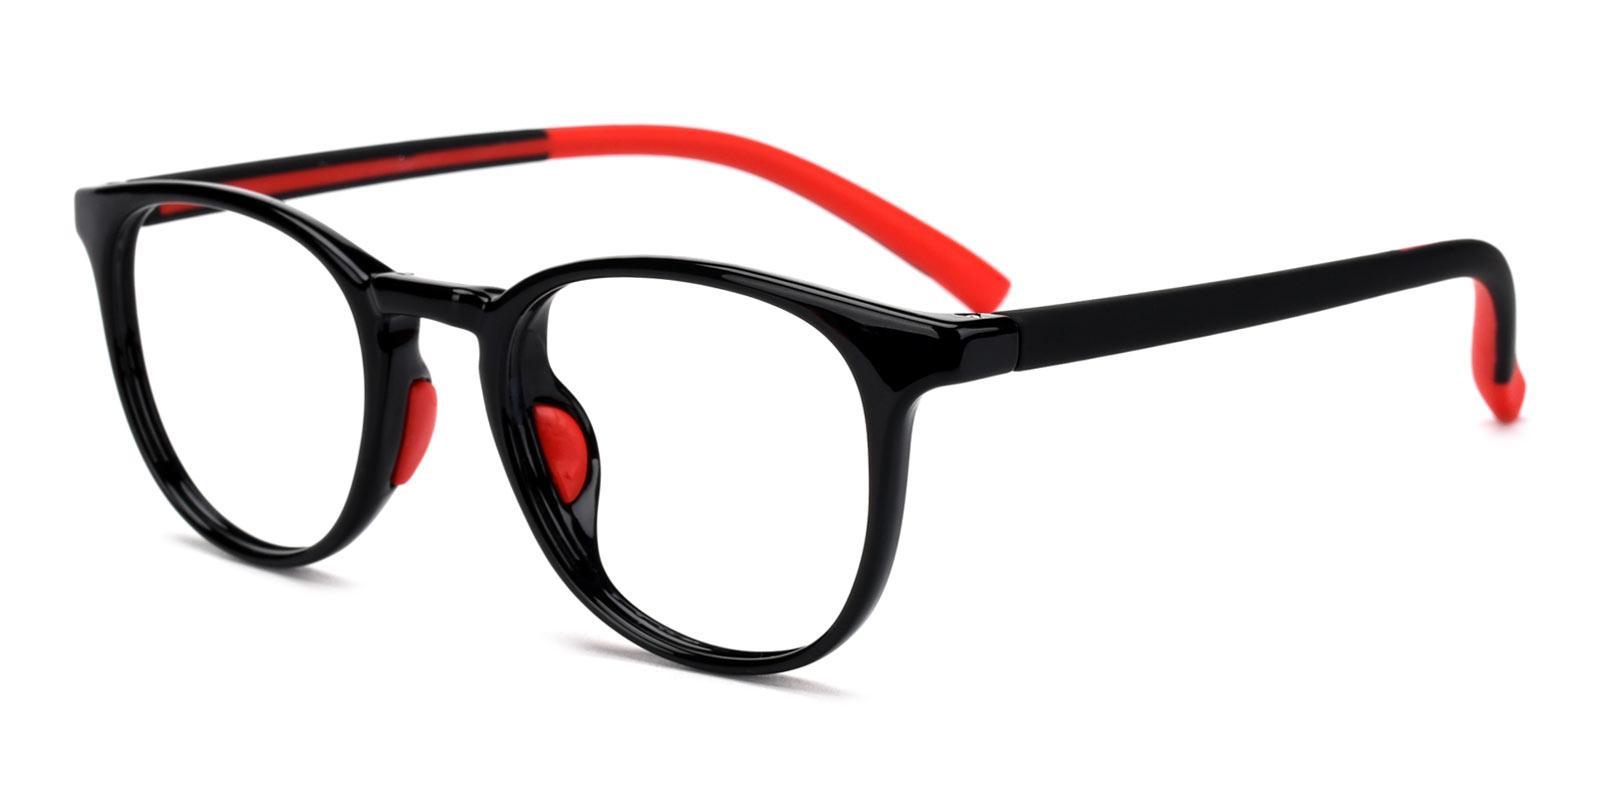 Elvis-Red-Round-Plastic-Eyeglasses-detail